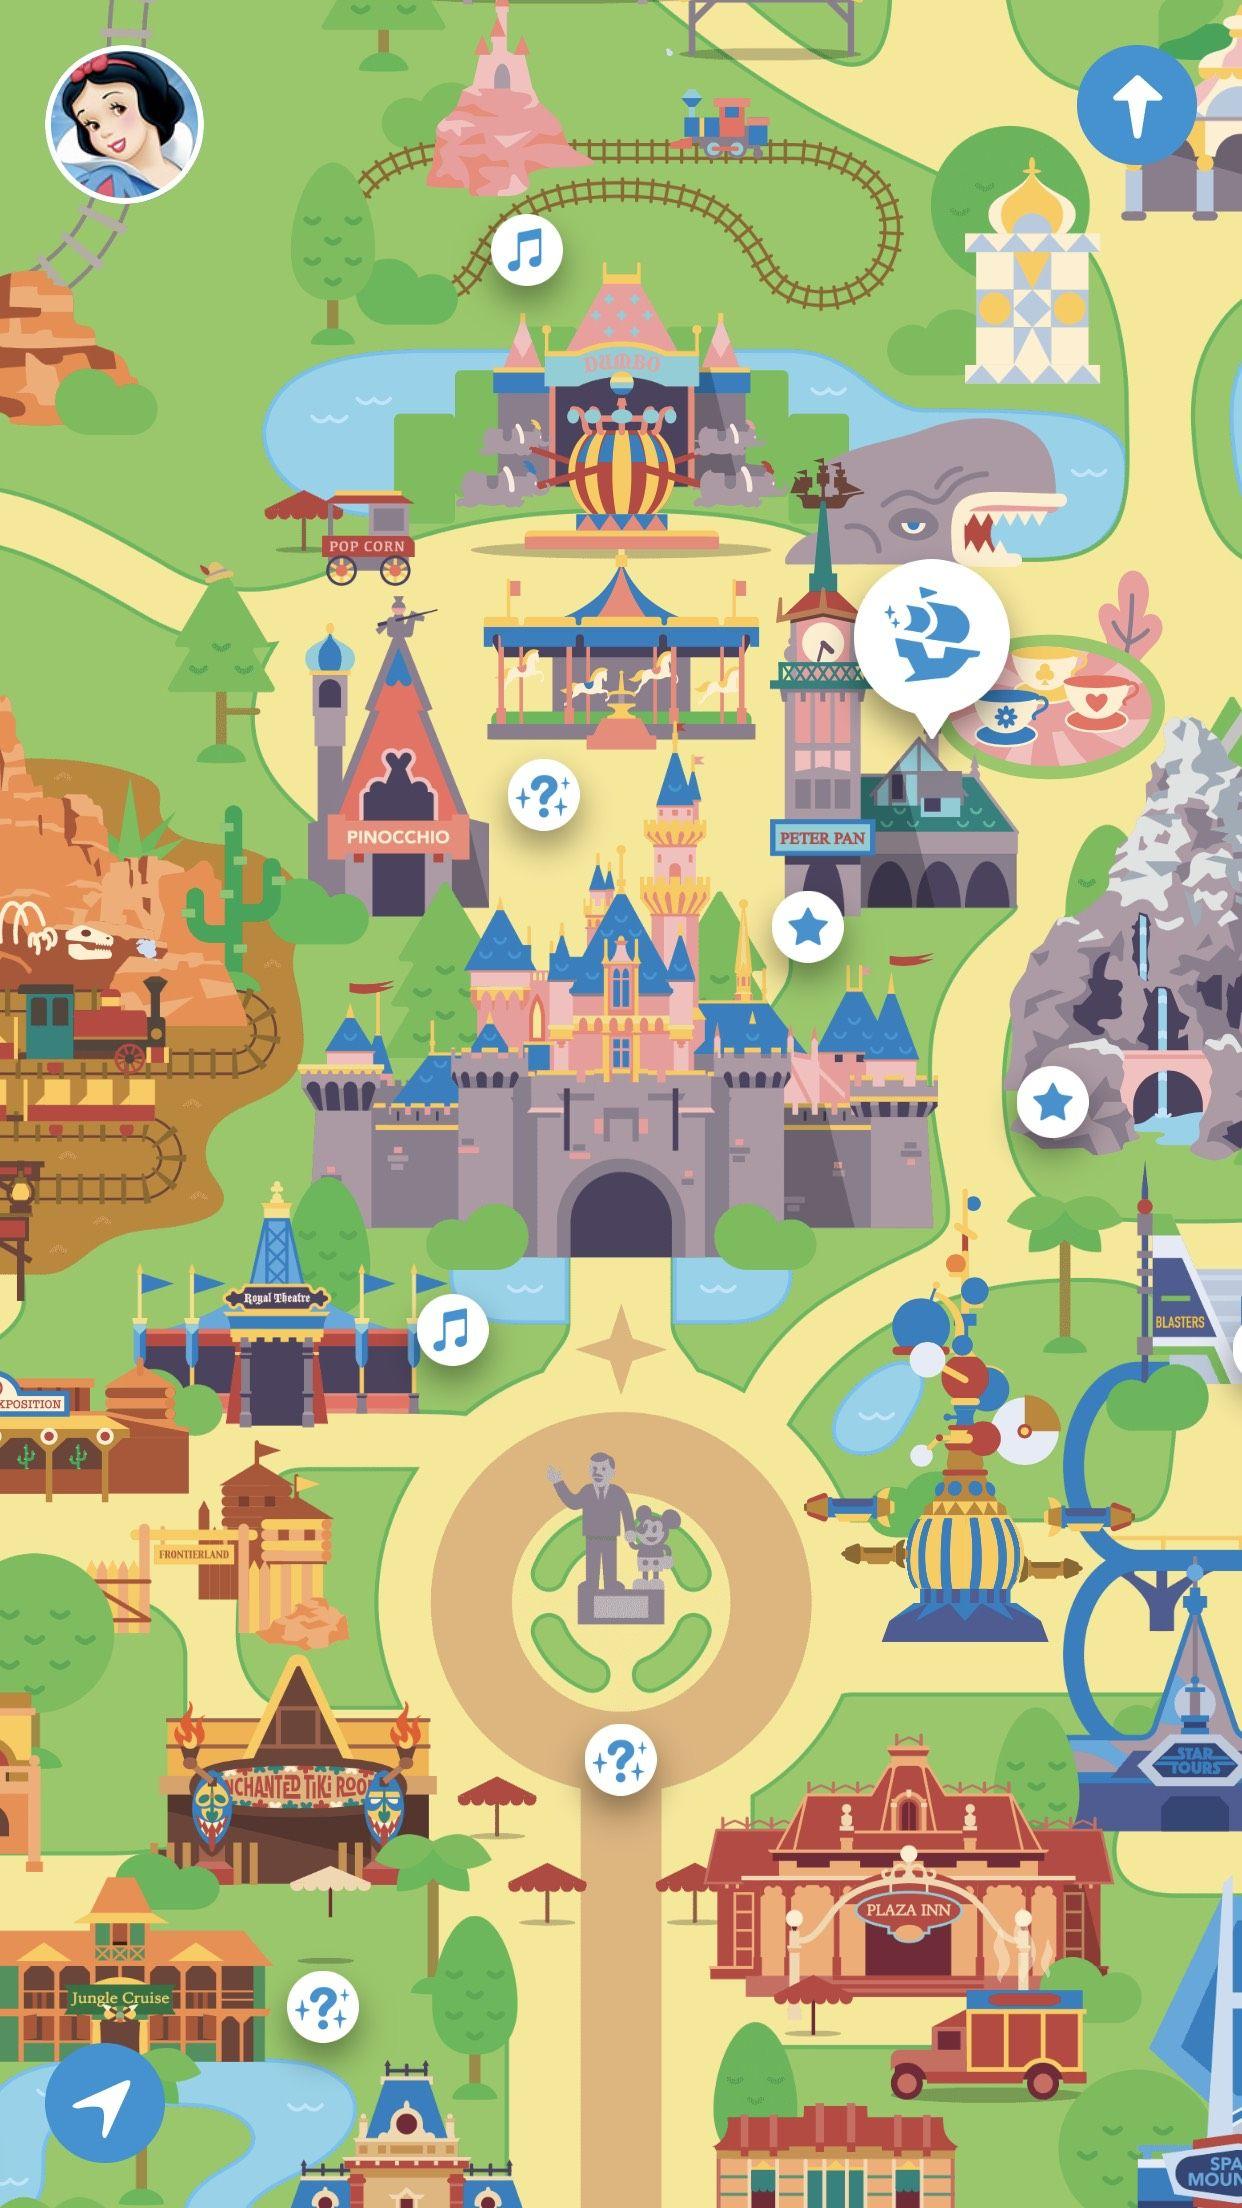 How to Use the Play Disney Parks App | Disneyland Daily in ... Disneyland Map App on disney world map app, disneyland street map, six flags map app,